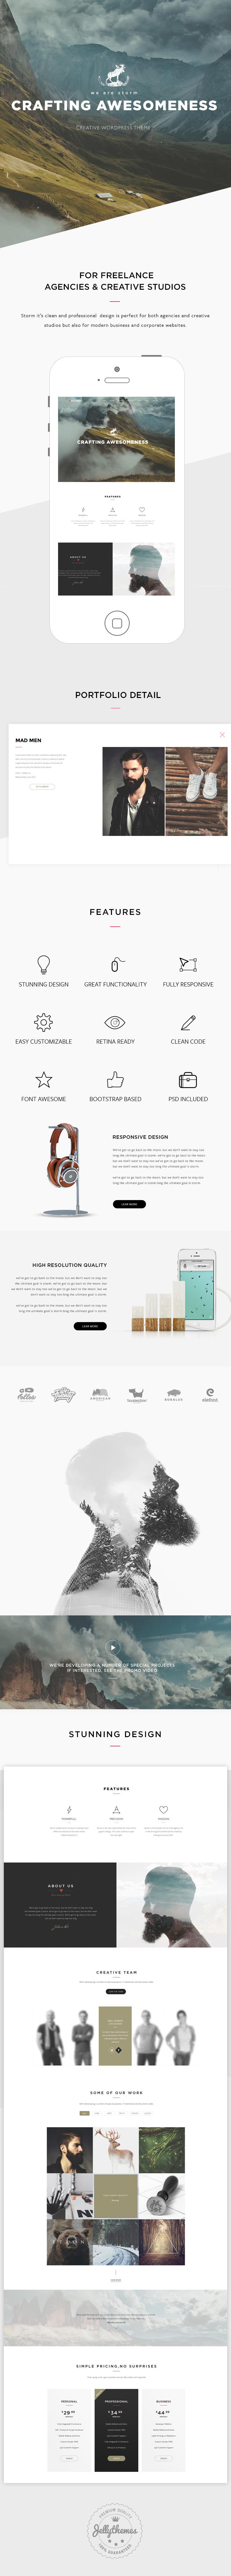 Storm - Creative Multi-Purpose WordPress Theme - 1